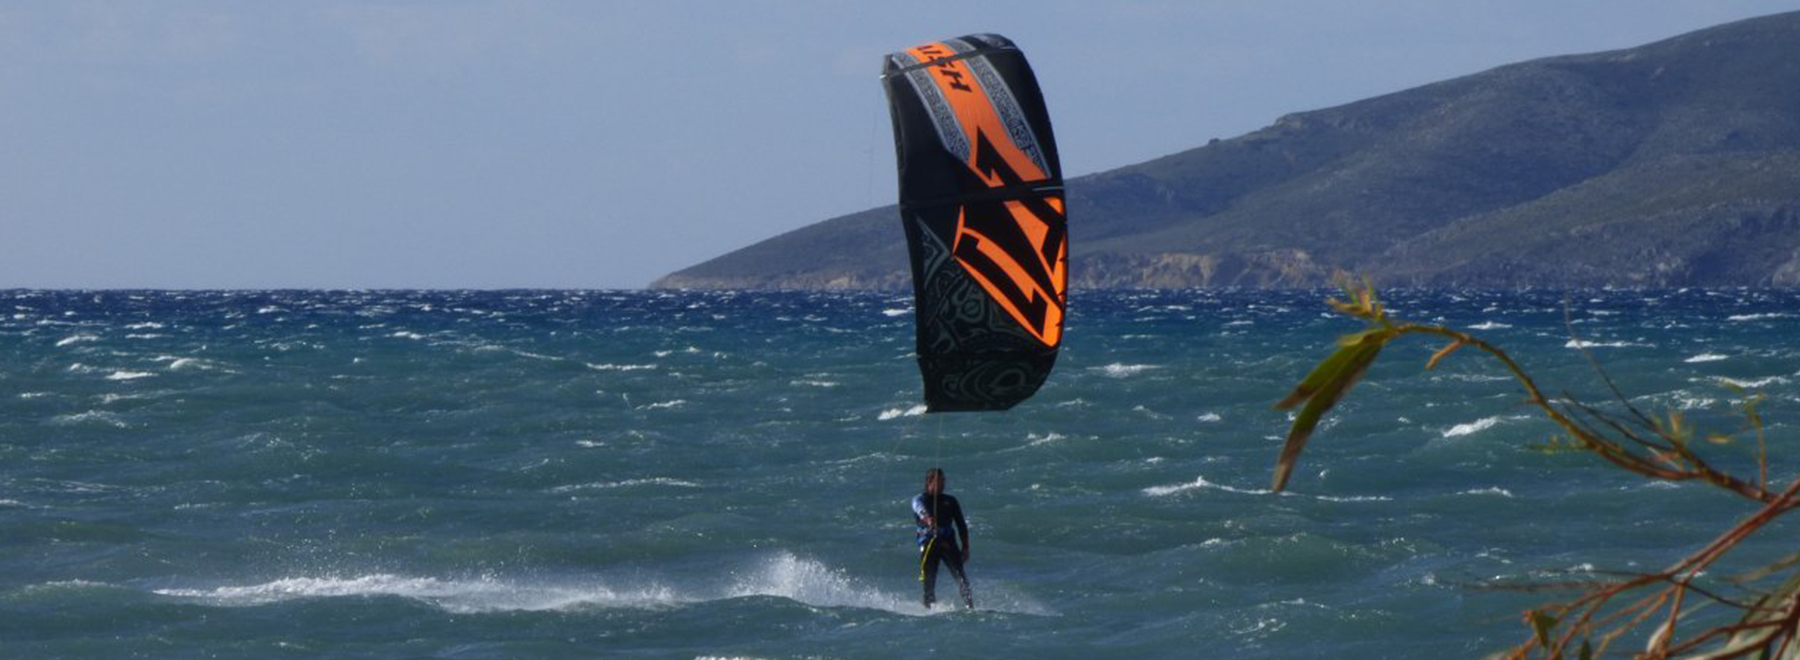 Kitesurfen Griechenland, Marmari